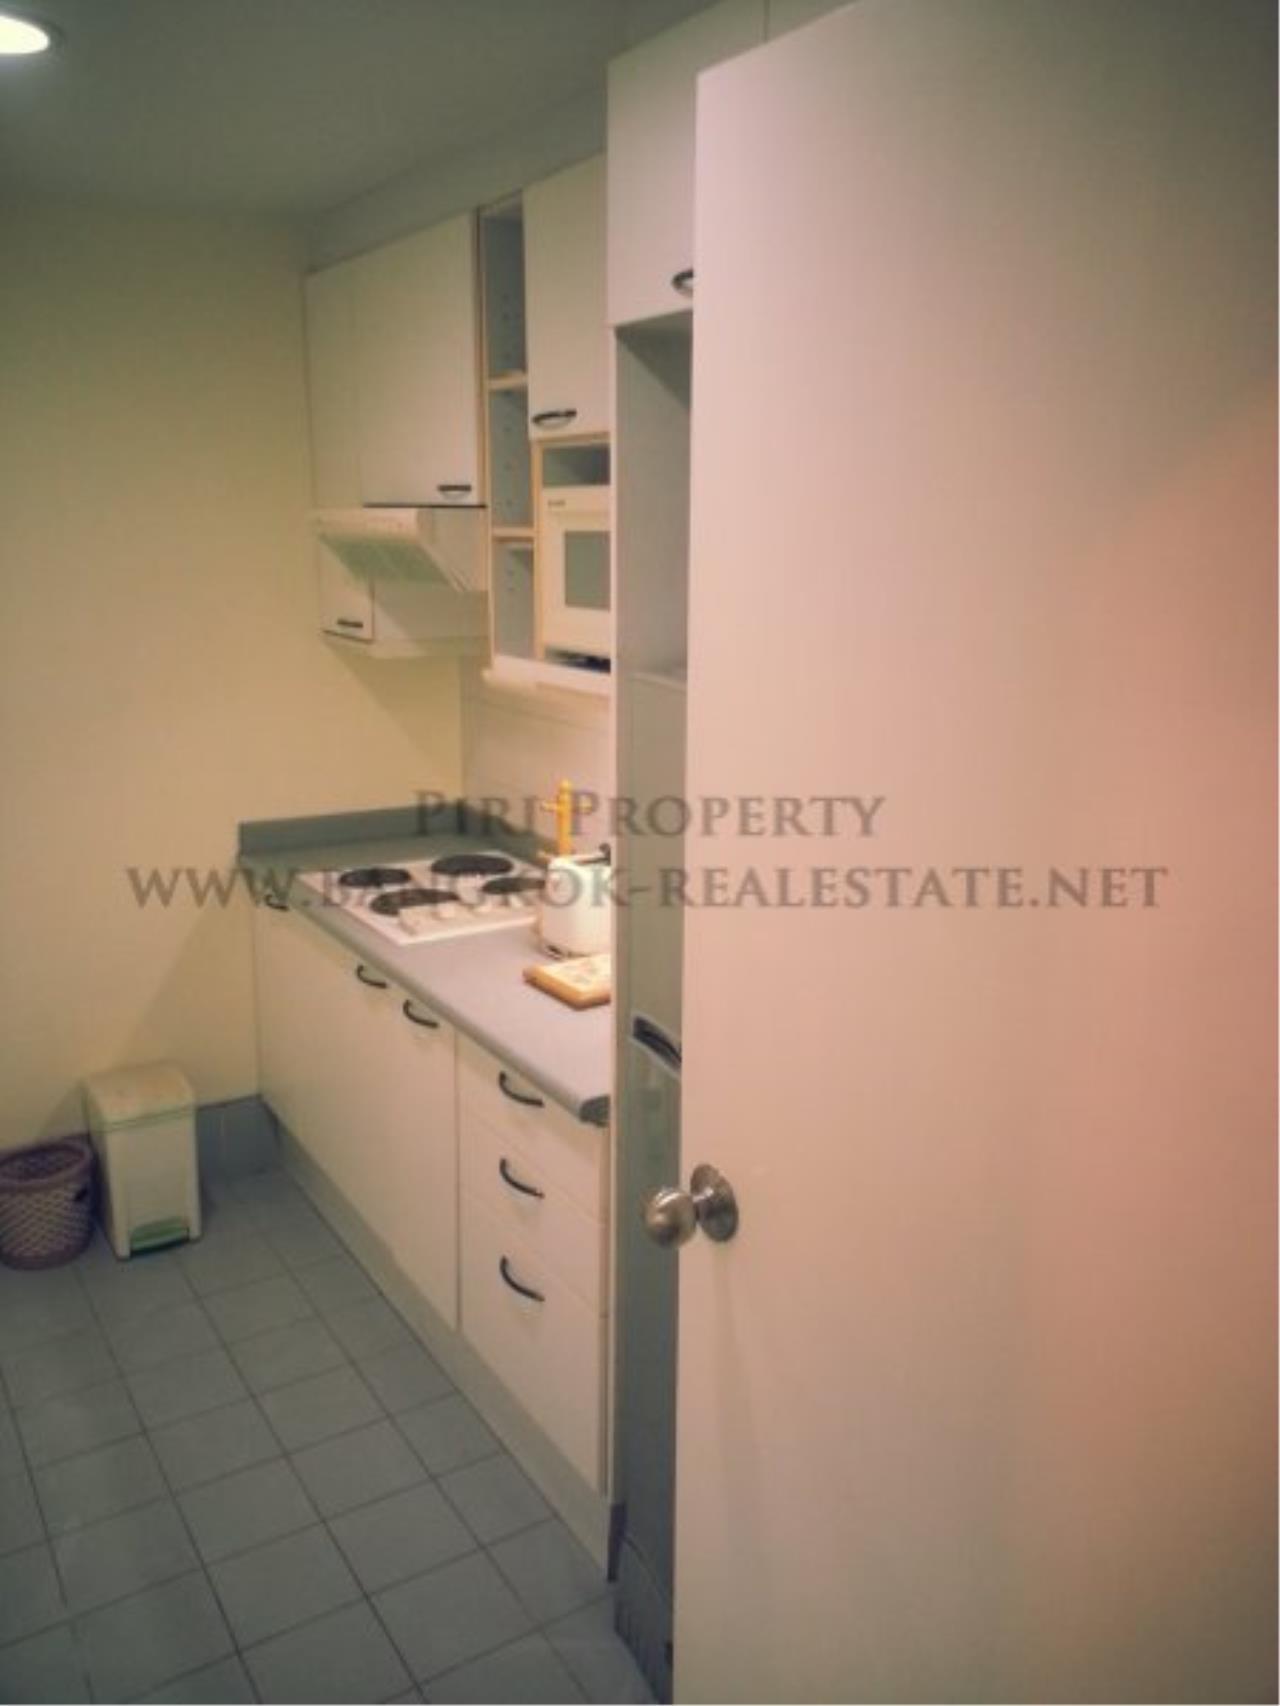 Piri Property Agency's Bangkok Garden - Spacious 2 Bedroom for 28K - Low Floor 6